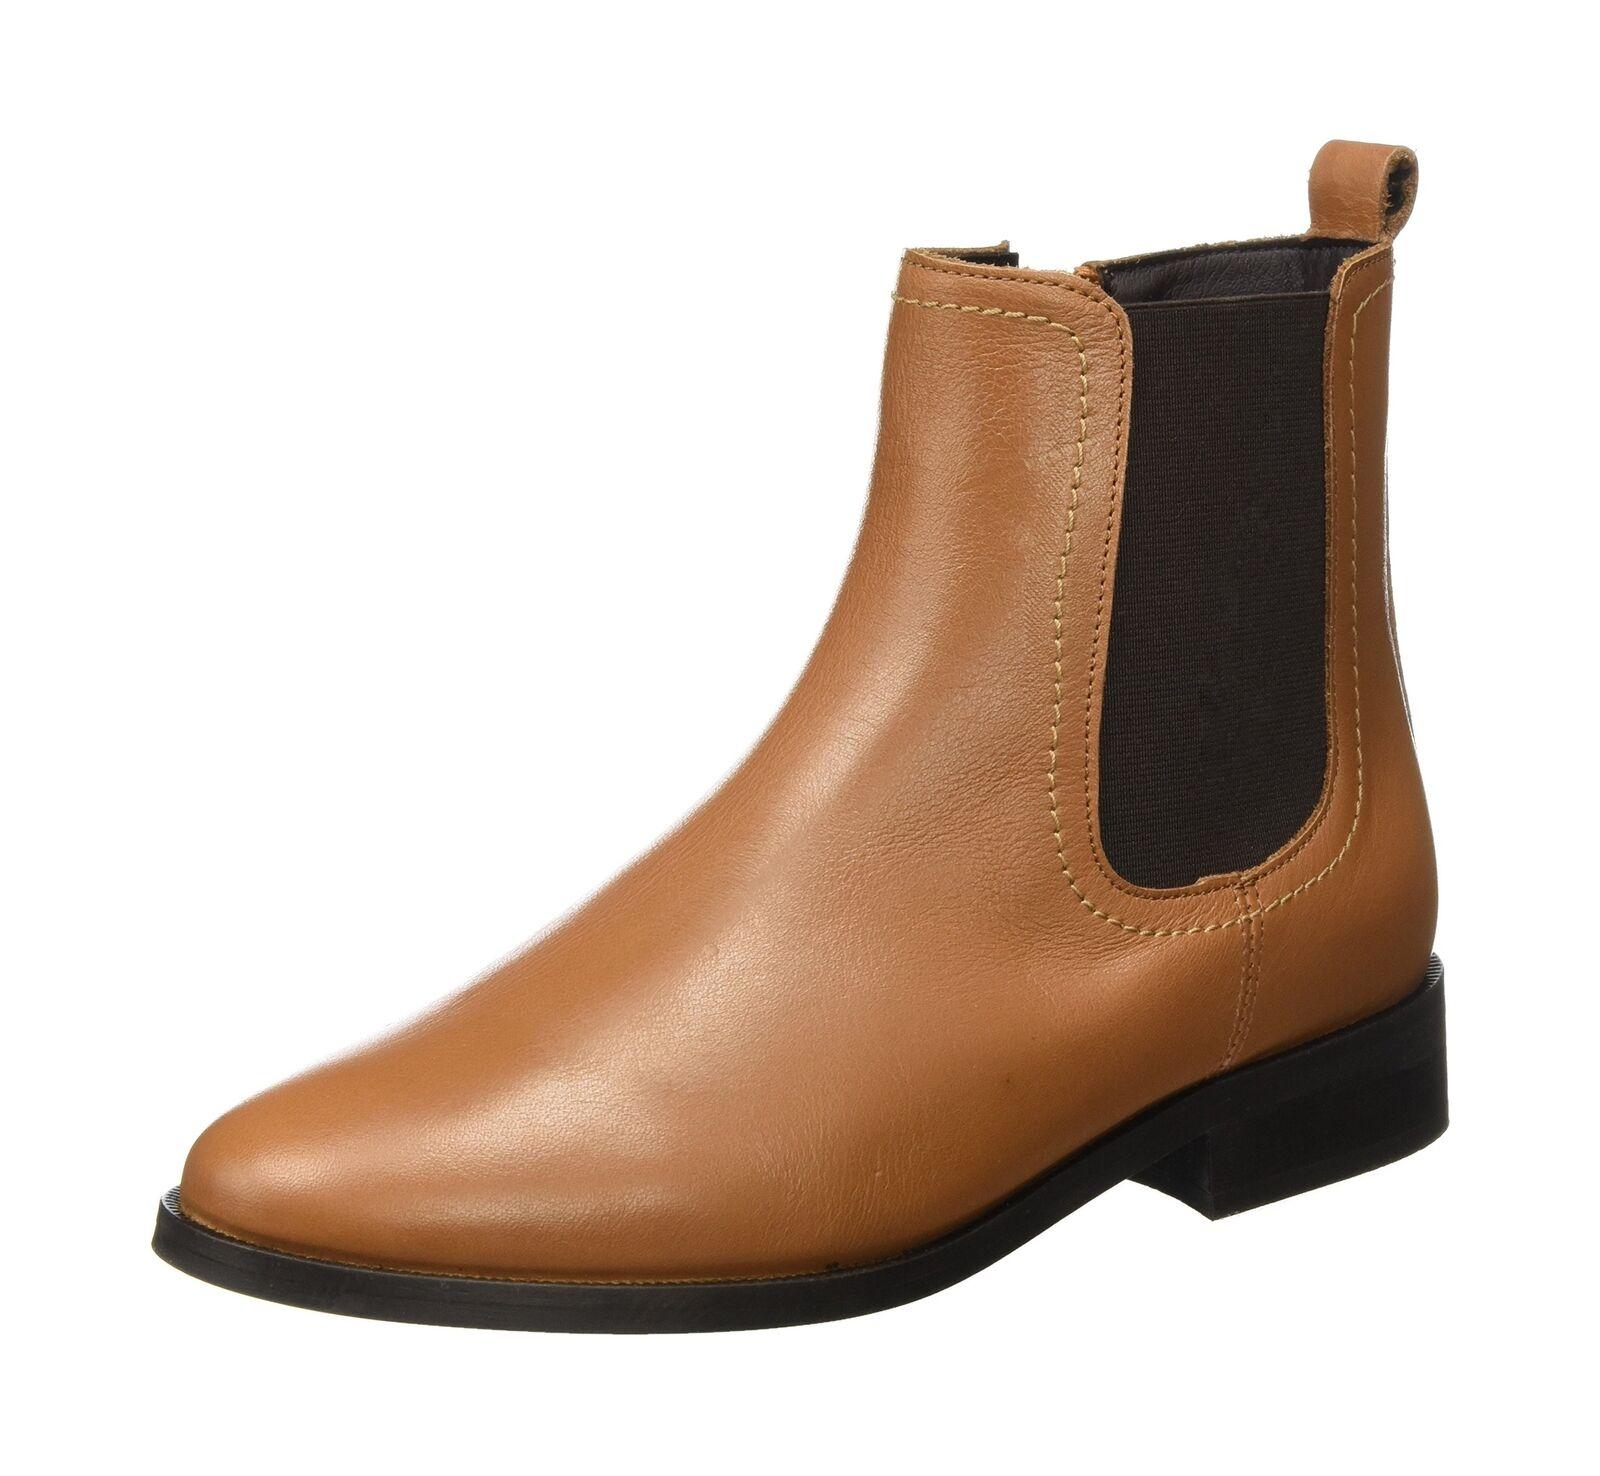 Buffalo Damens's ES 0) 30855l Sauvage Chelsea Stiefel Braun (Cognac 01 0) ES 4.5 UK 553471